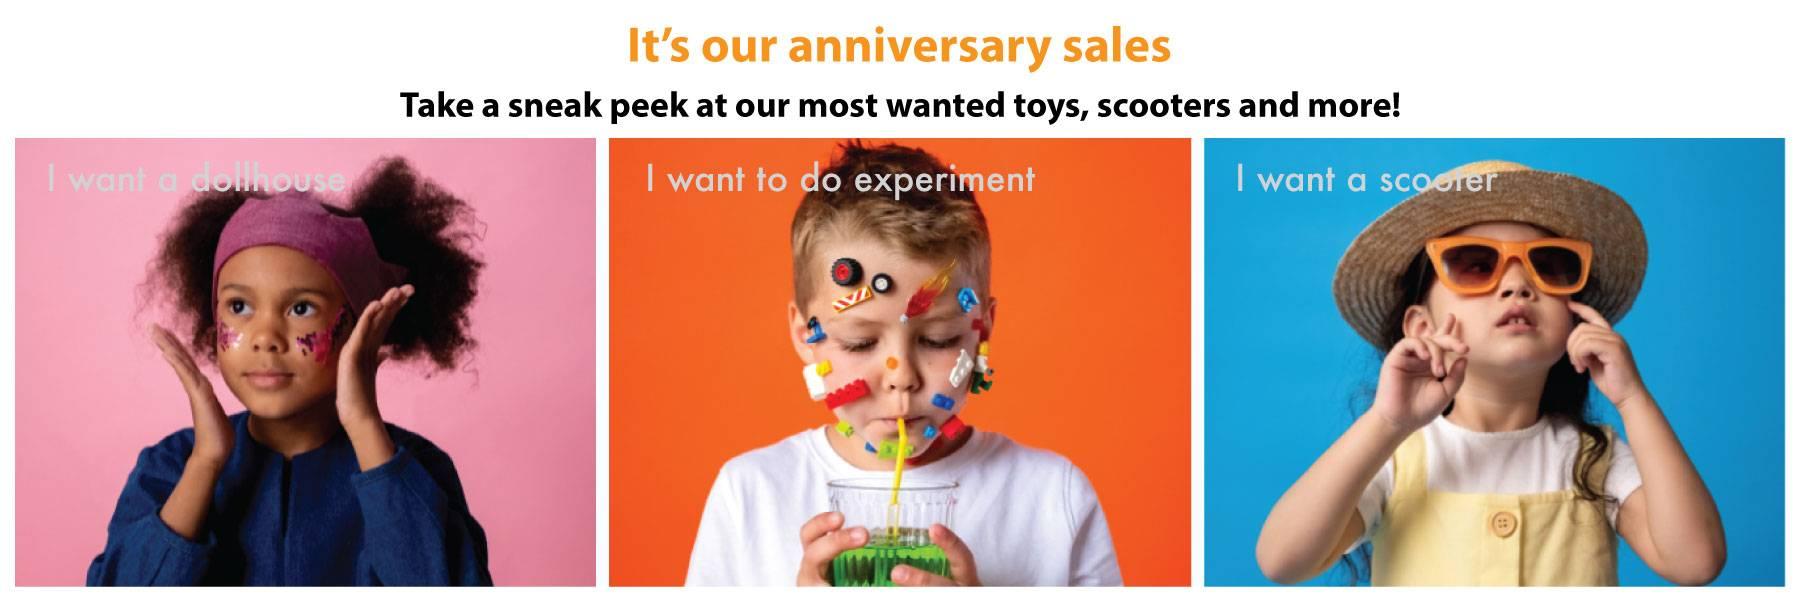 Anniversary Sales 2021